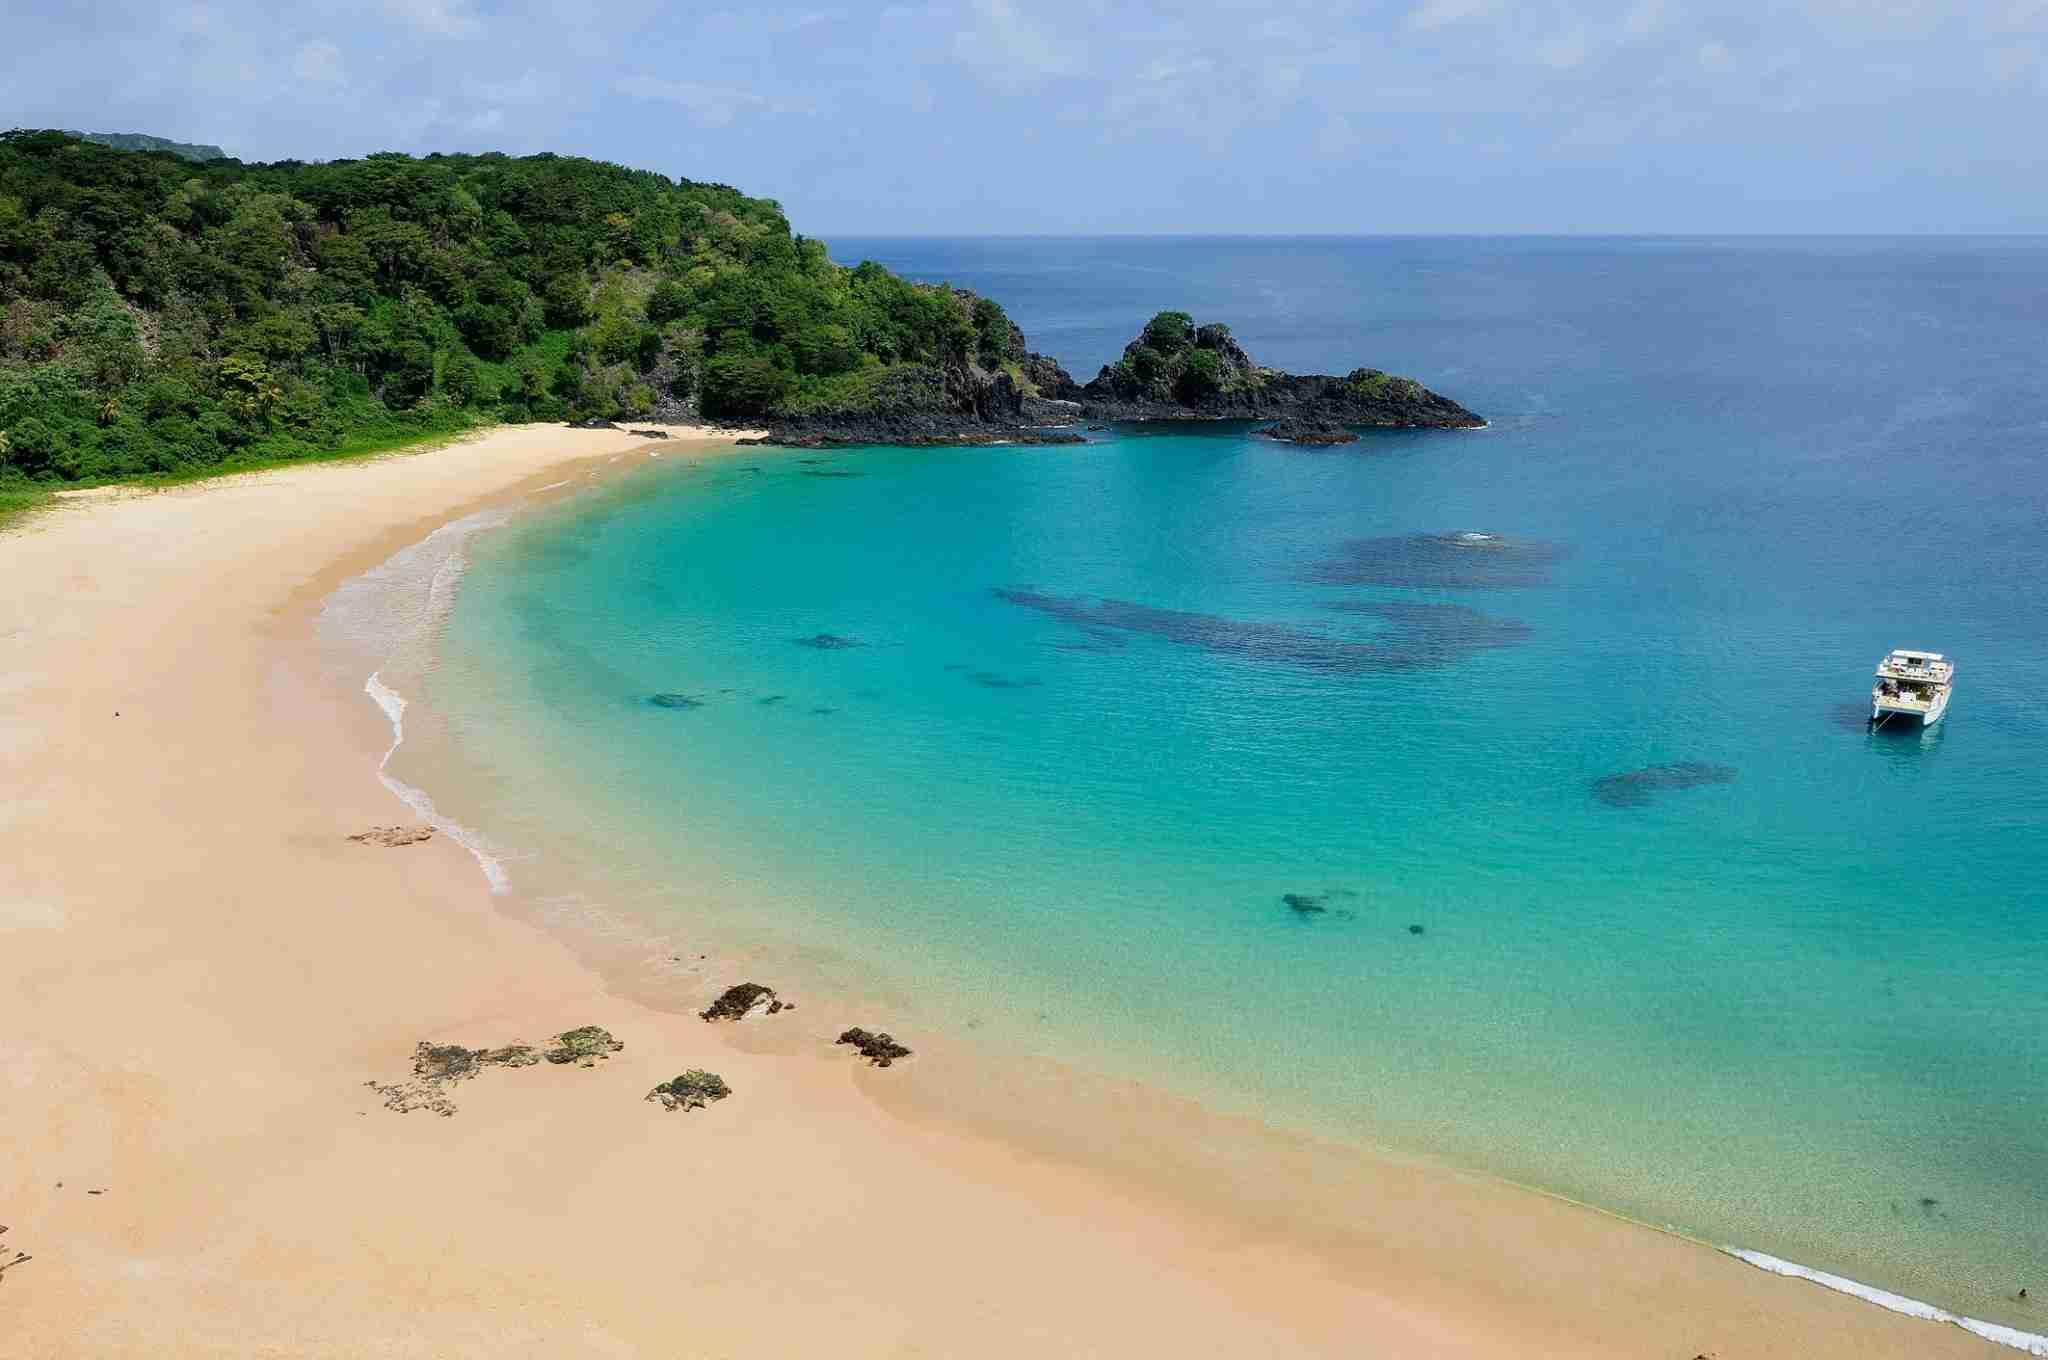 Baía do Sancho was ranked by Tripadvisor as the best beach in the world.